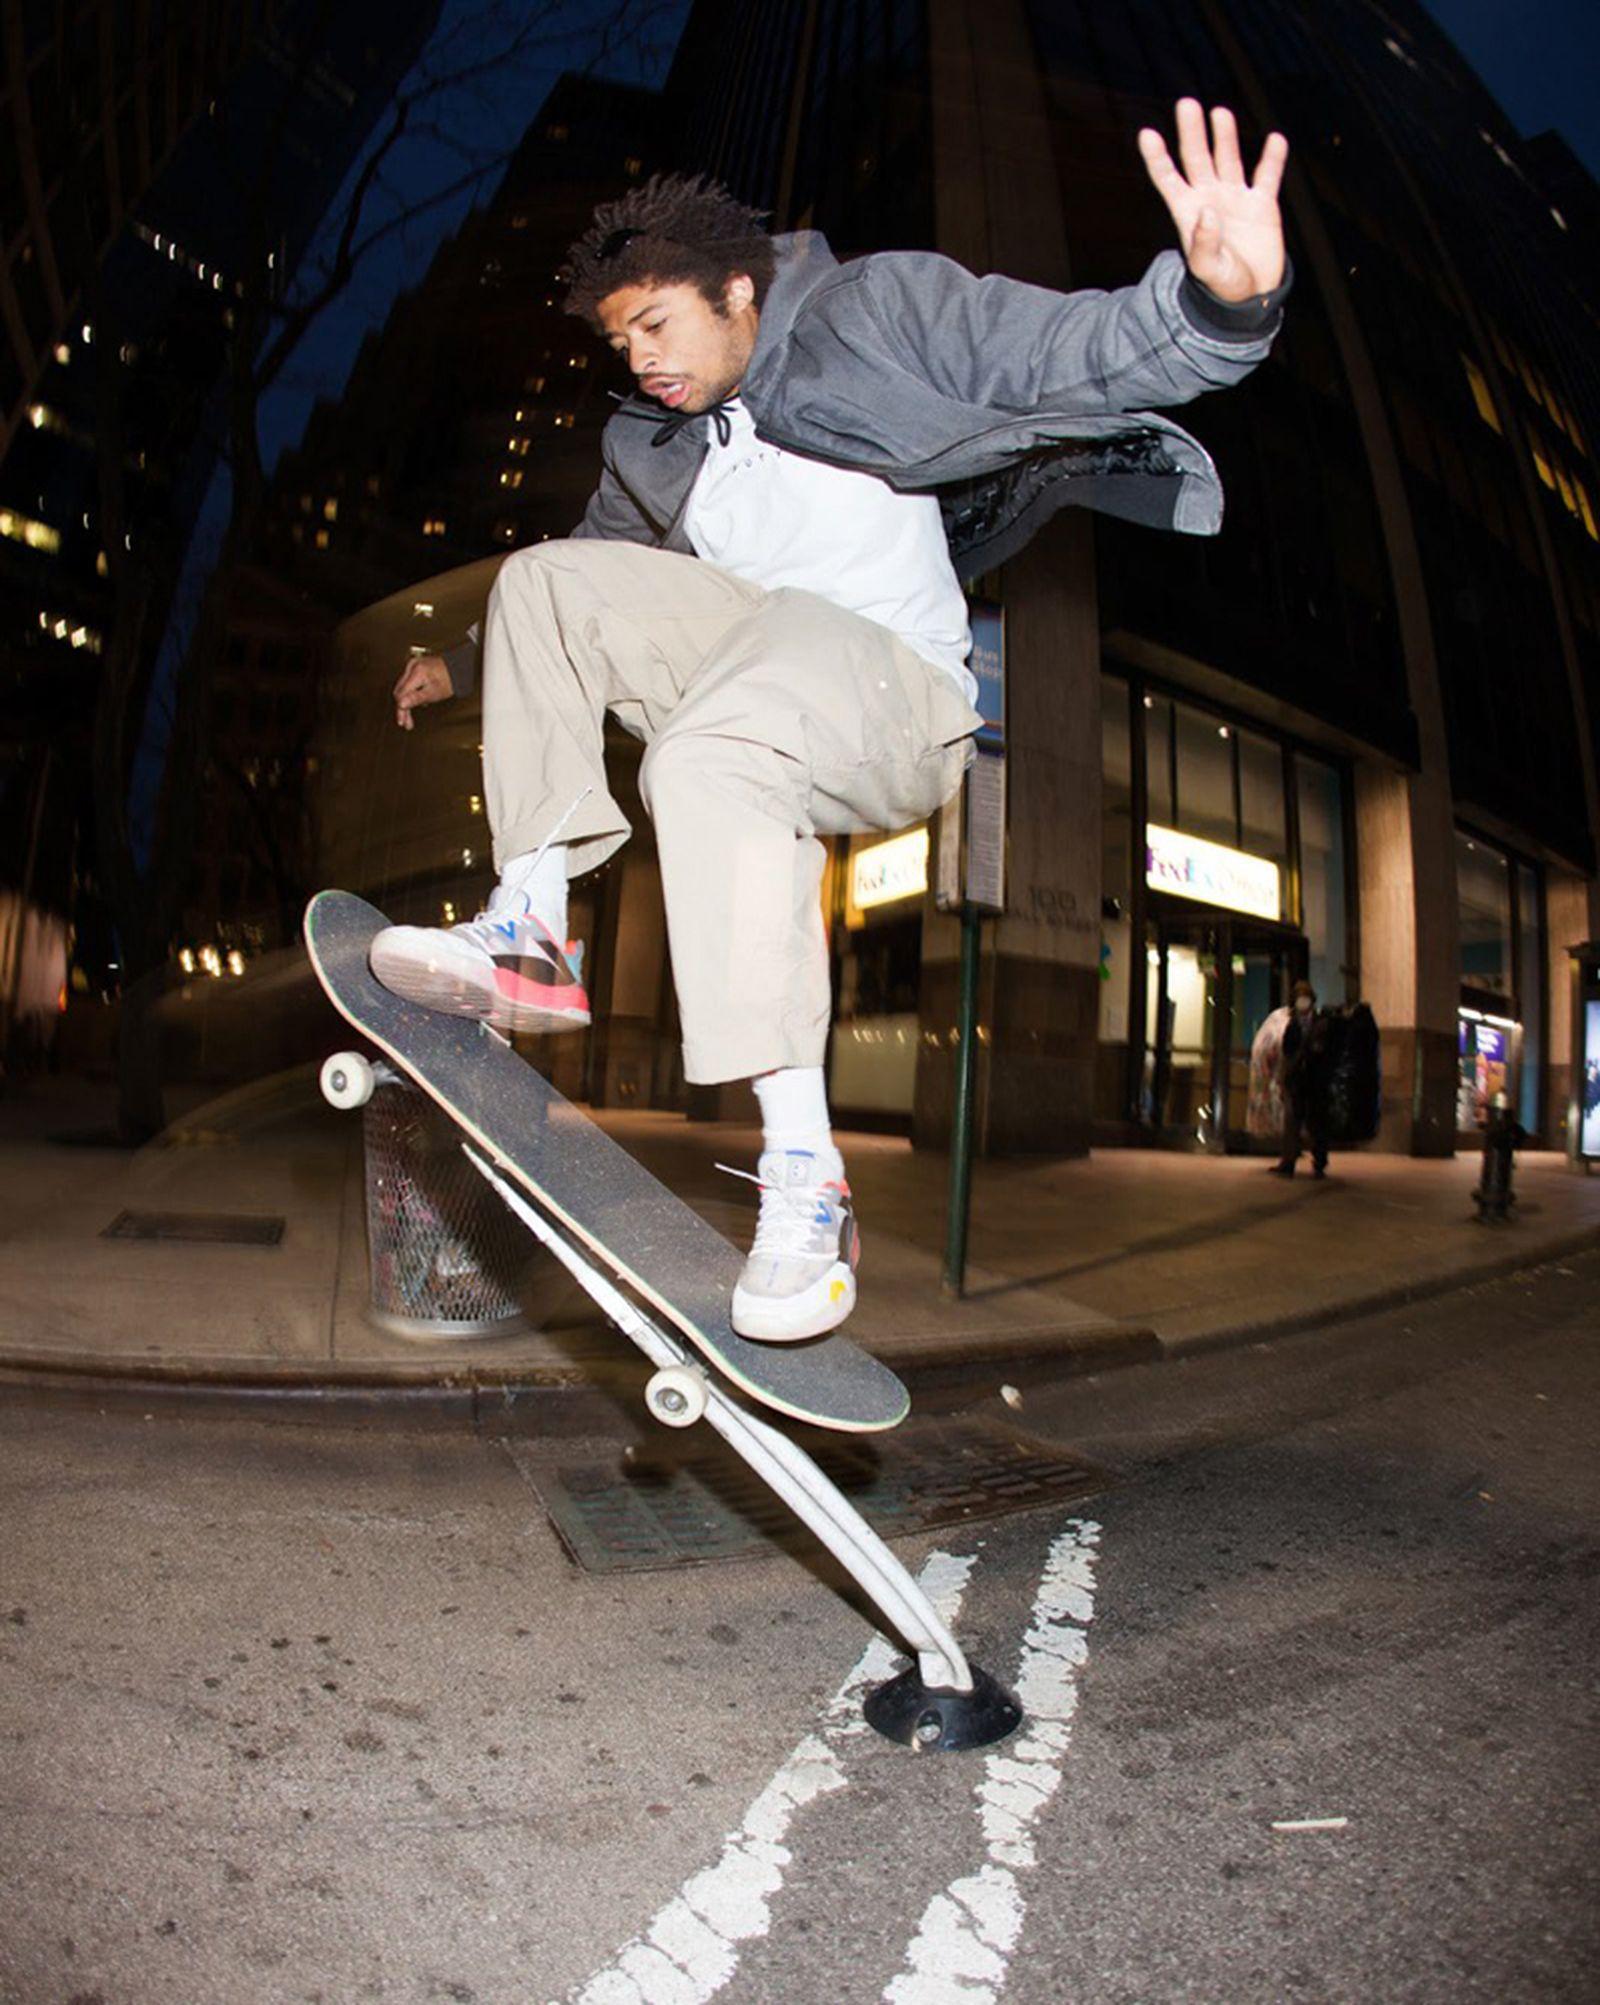 li-ning-skate-collection-erik-ellington-release-date-price-03